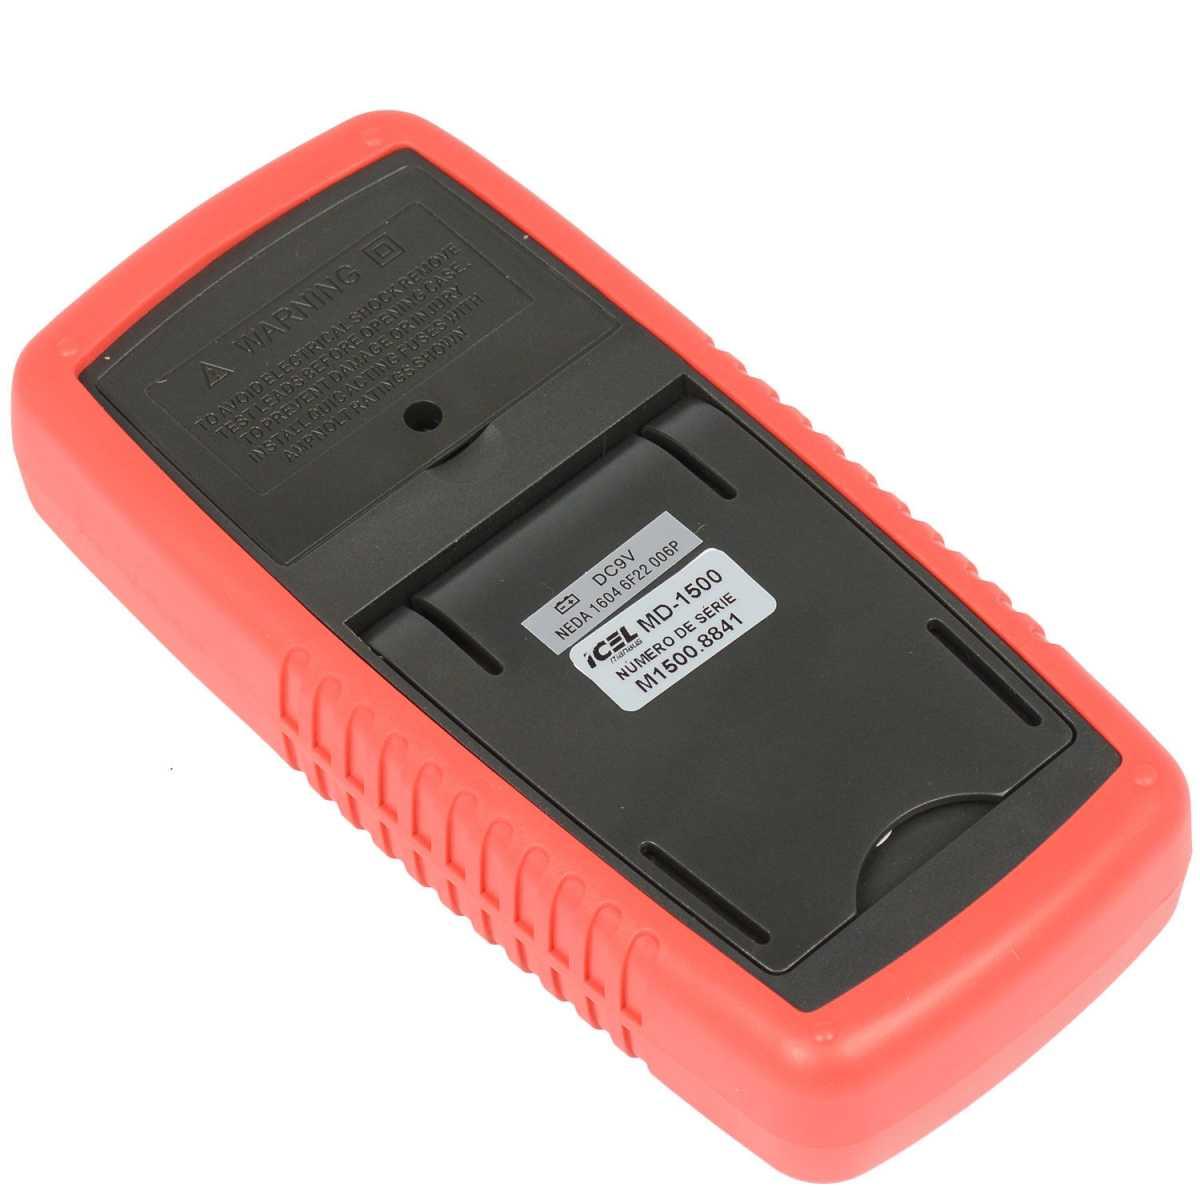 Multimetro Digital Ac/dc Md-1500 Icel - 10 Amperes